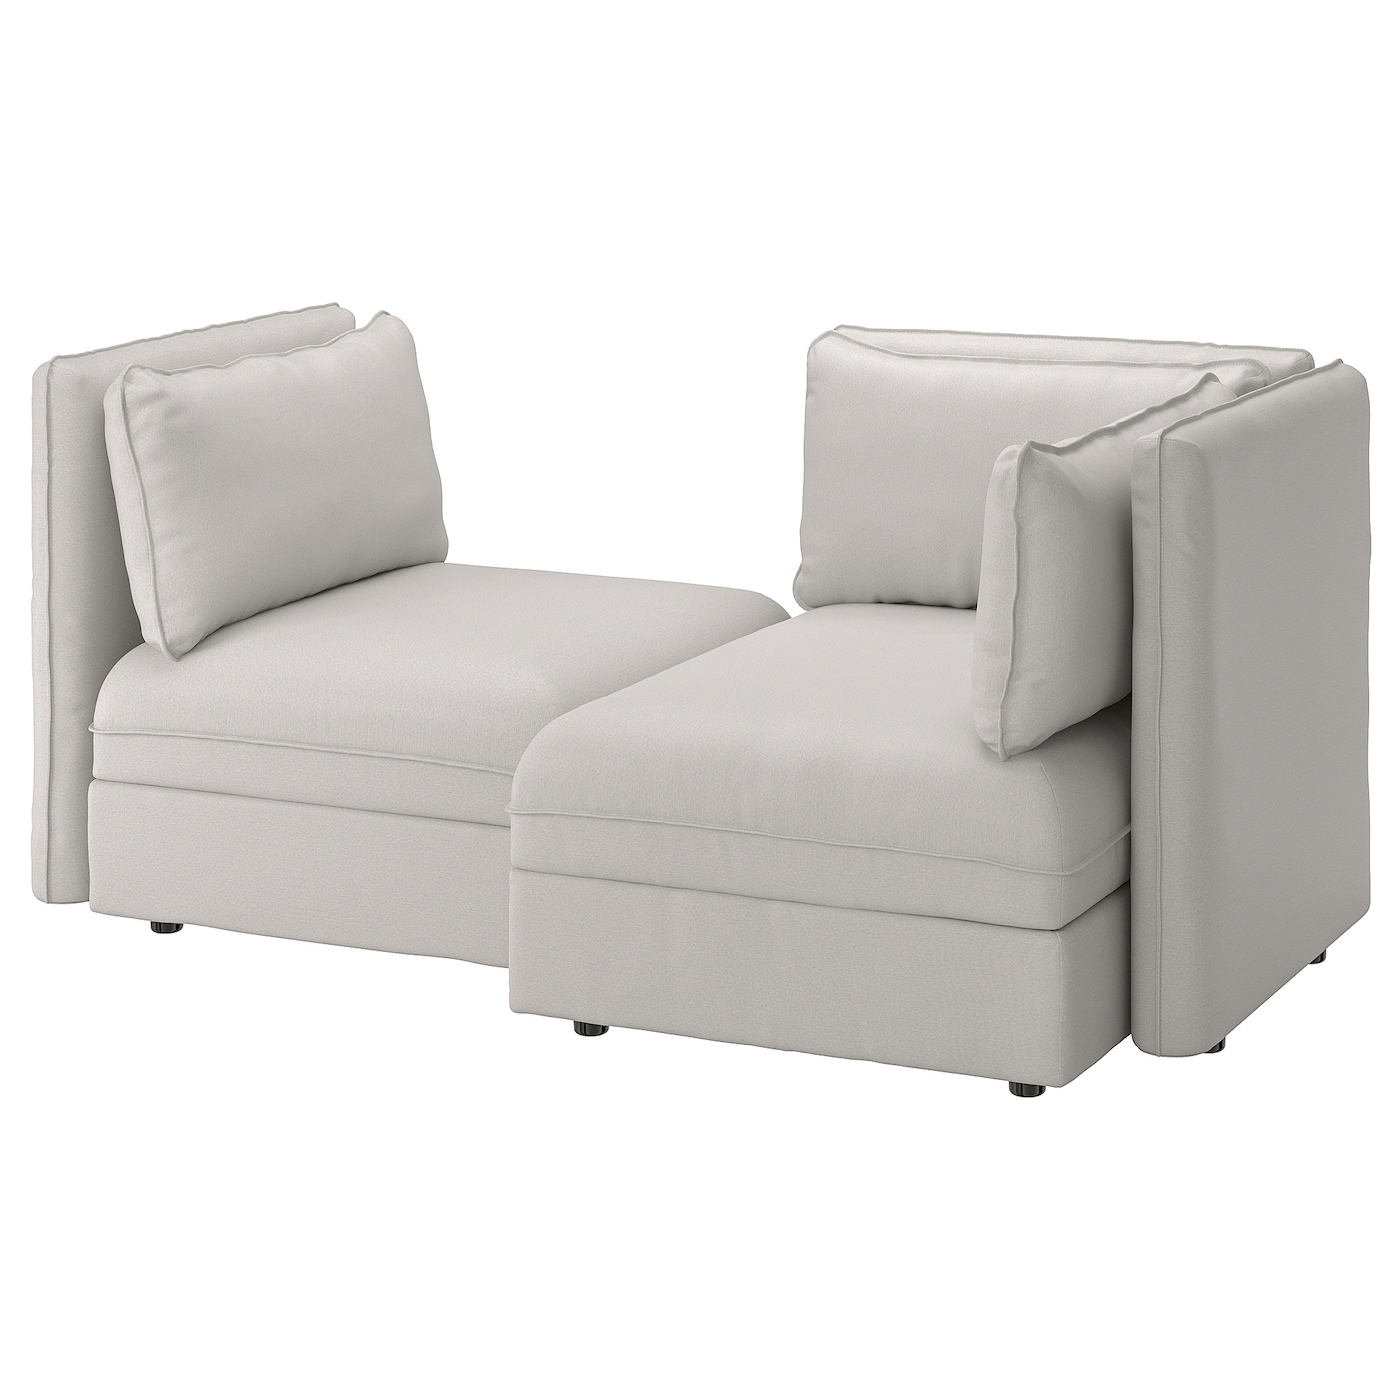 2 Seat Modular Sofa